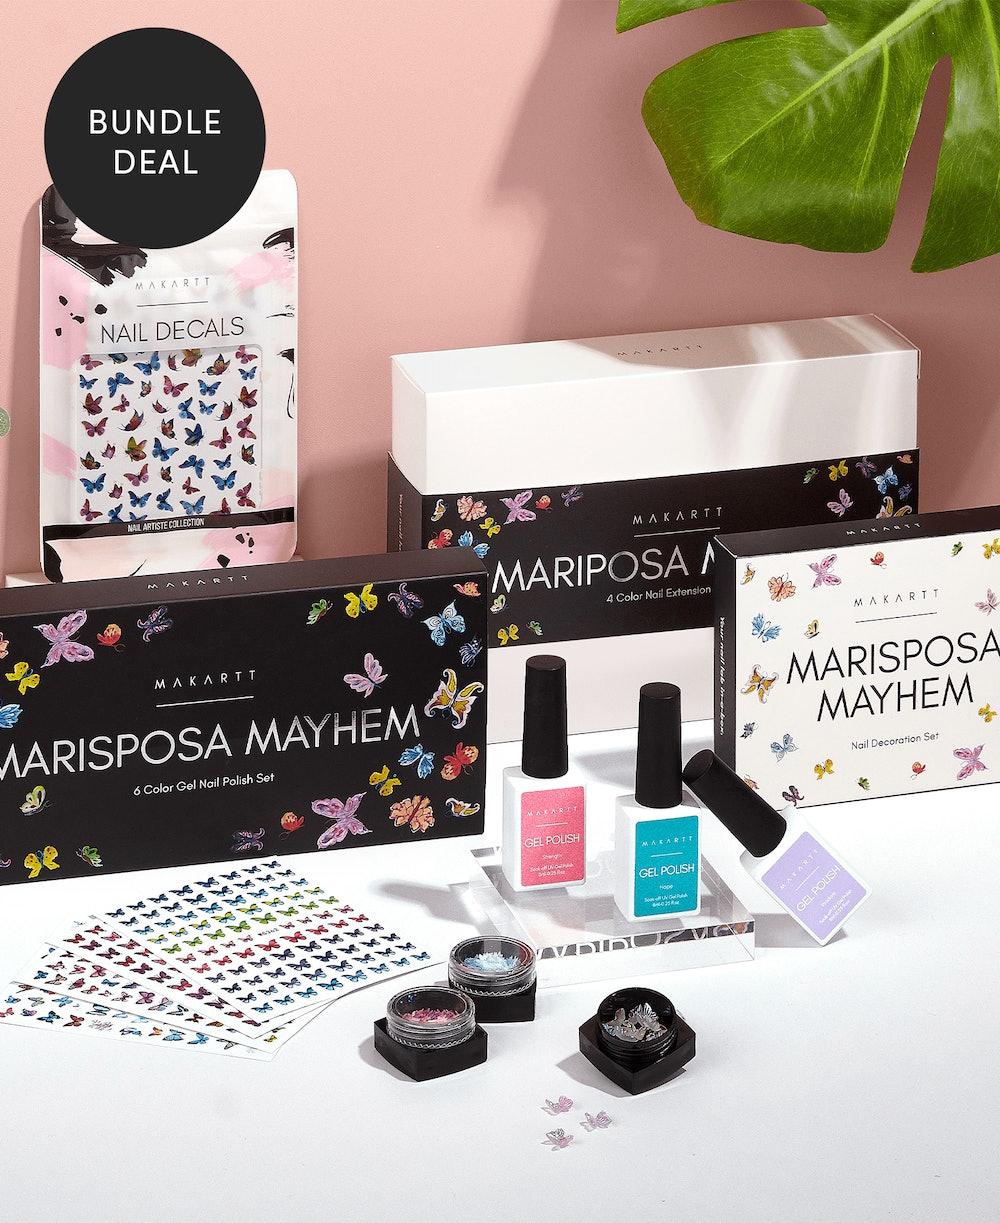 Mariposa Mayhem Full Collection Bundle